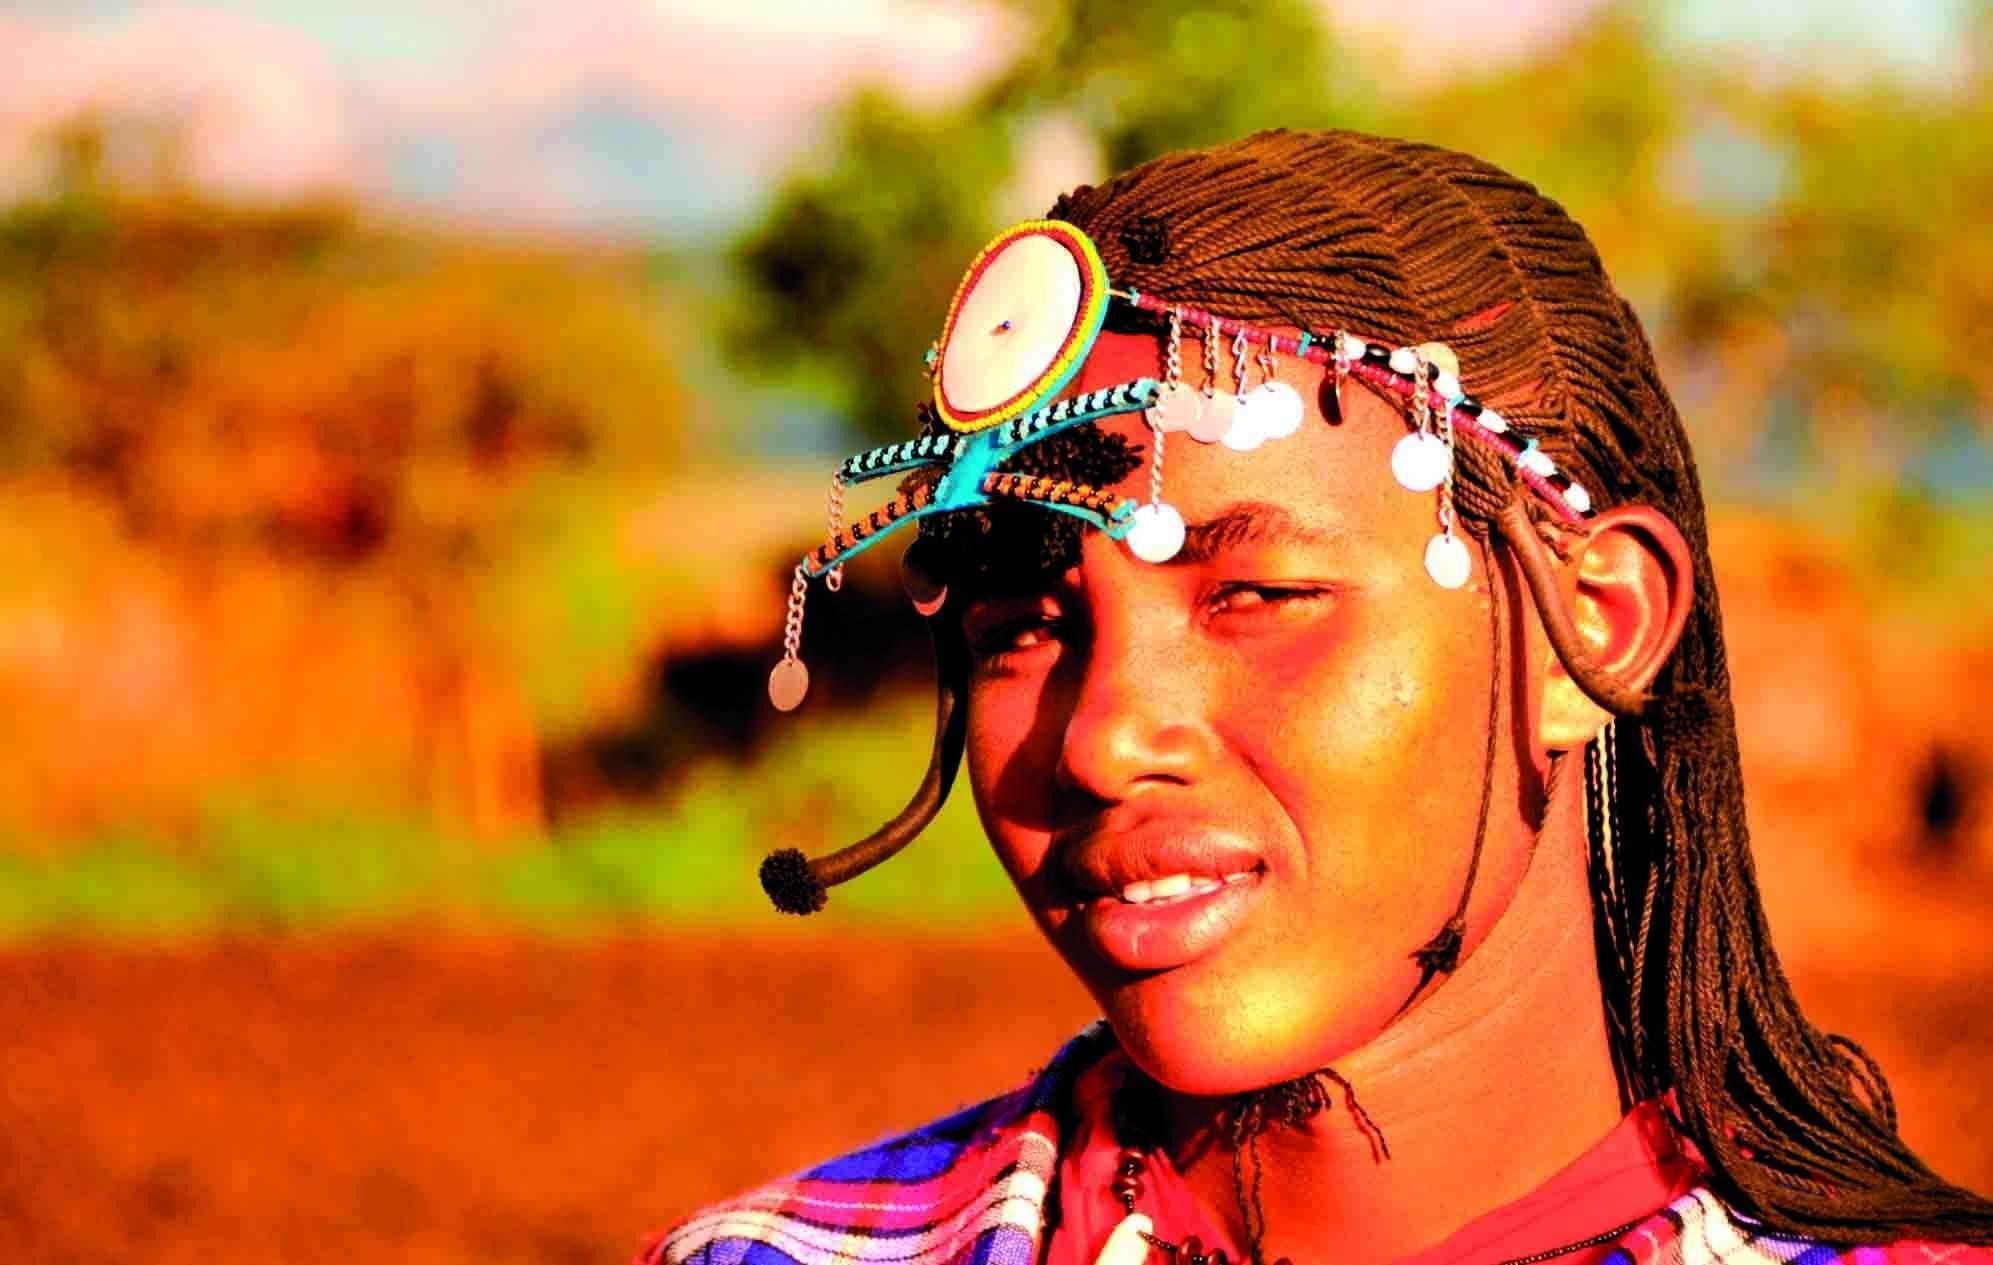 Kenia Safari-Classic: Ruta de los Guerreros Masai